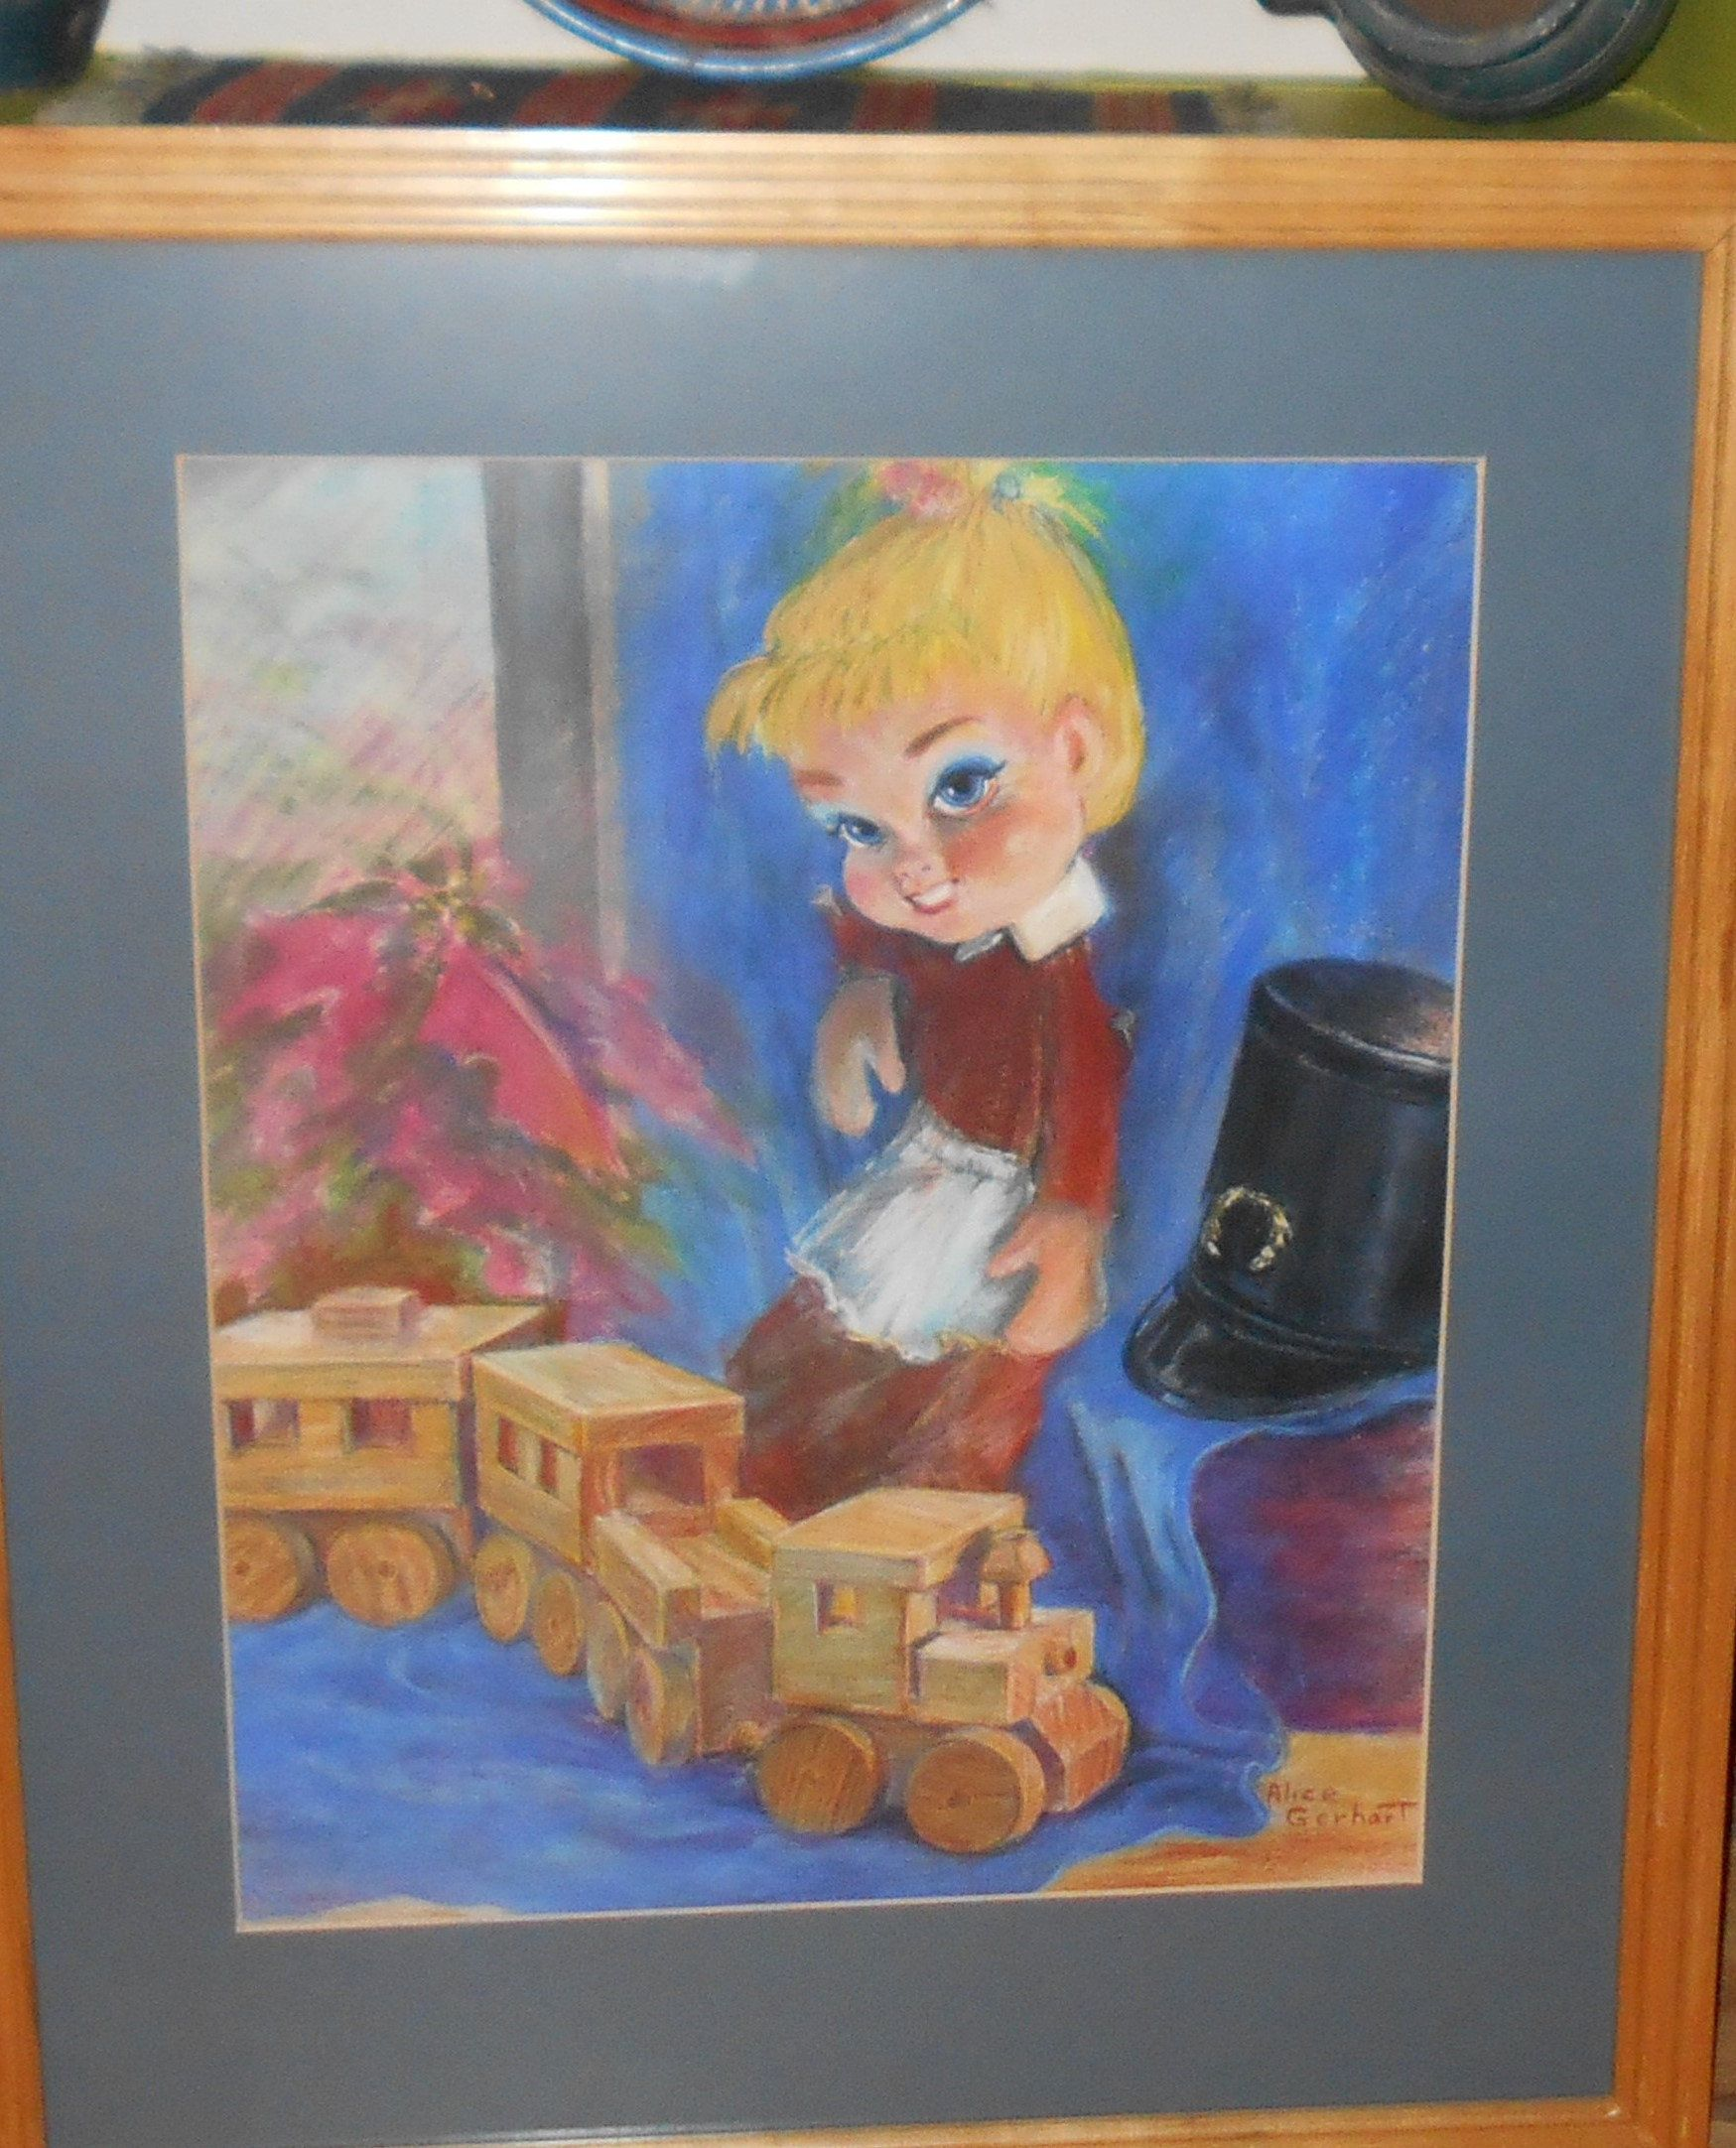 Vintage Big Eye Girl Train Toy Conductor Glass Framed Pastels Art By Alice Gerhart Pastel Art Big Eyes